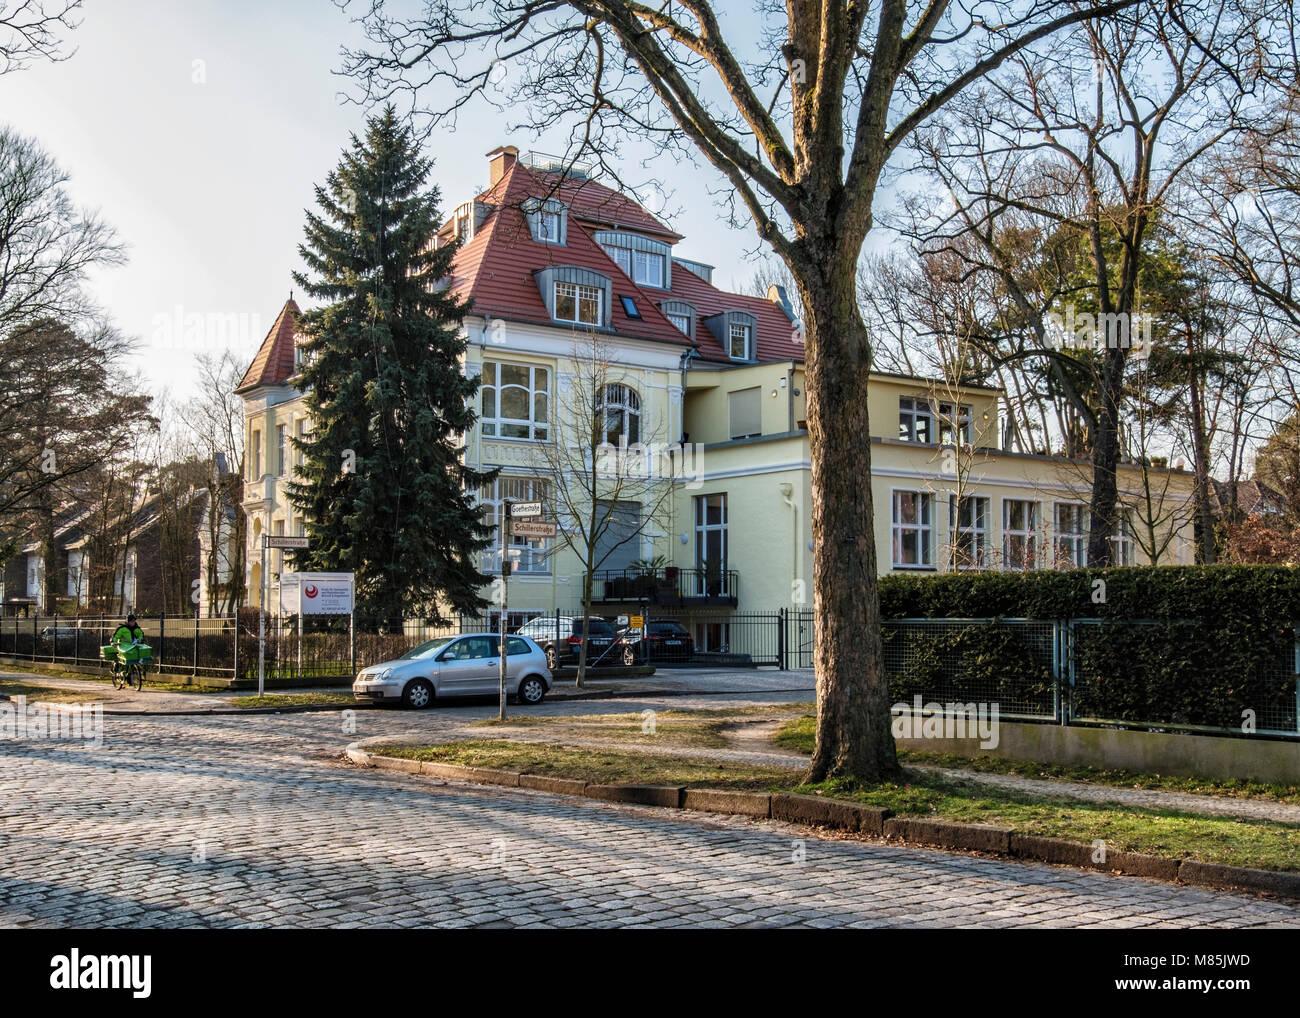 Jwd Berlin berlin zehlenfdorf large residence historic traditional house